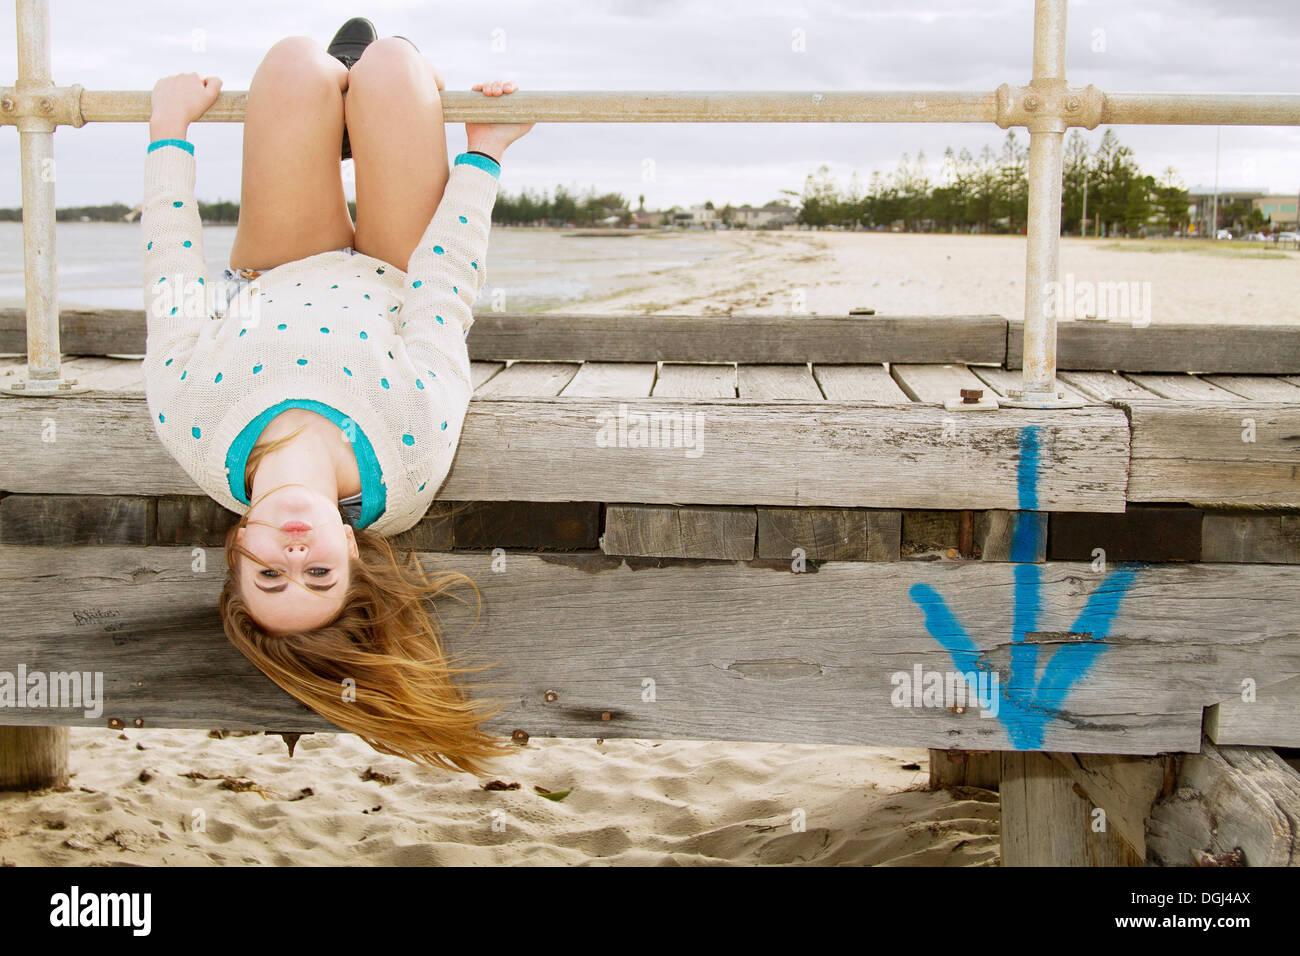 nude girls upside down